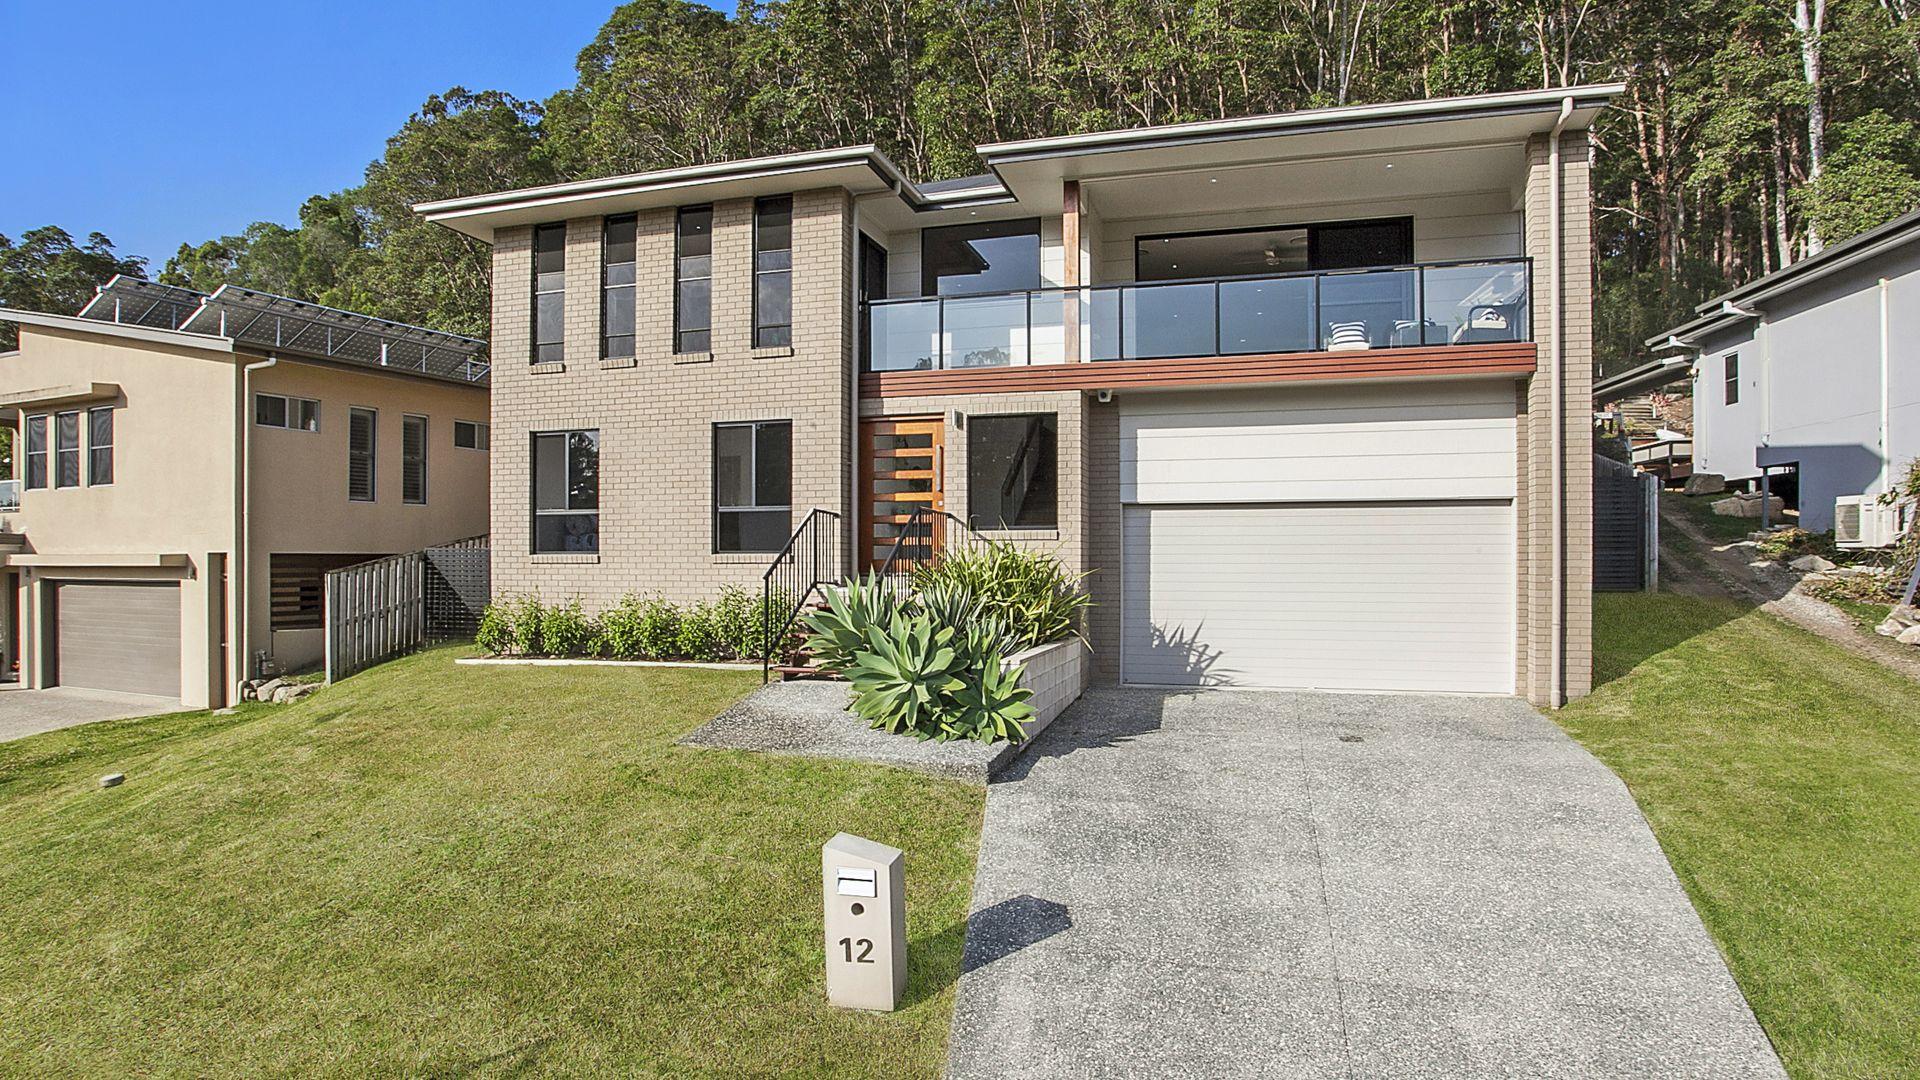 12 Ensor Street, Mudgeeraba QLD 4213, Image 1